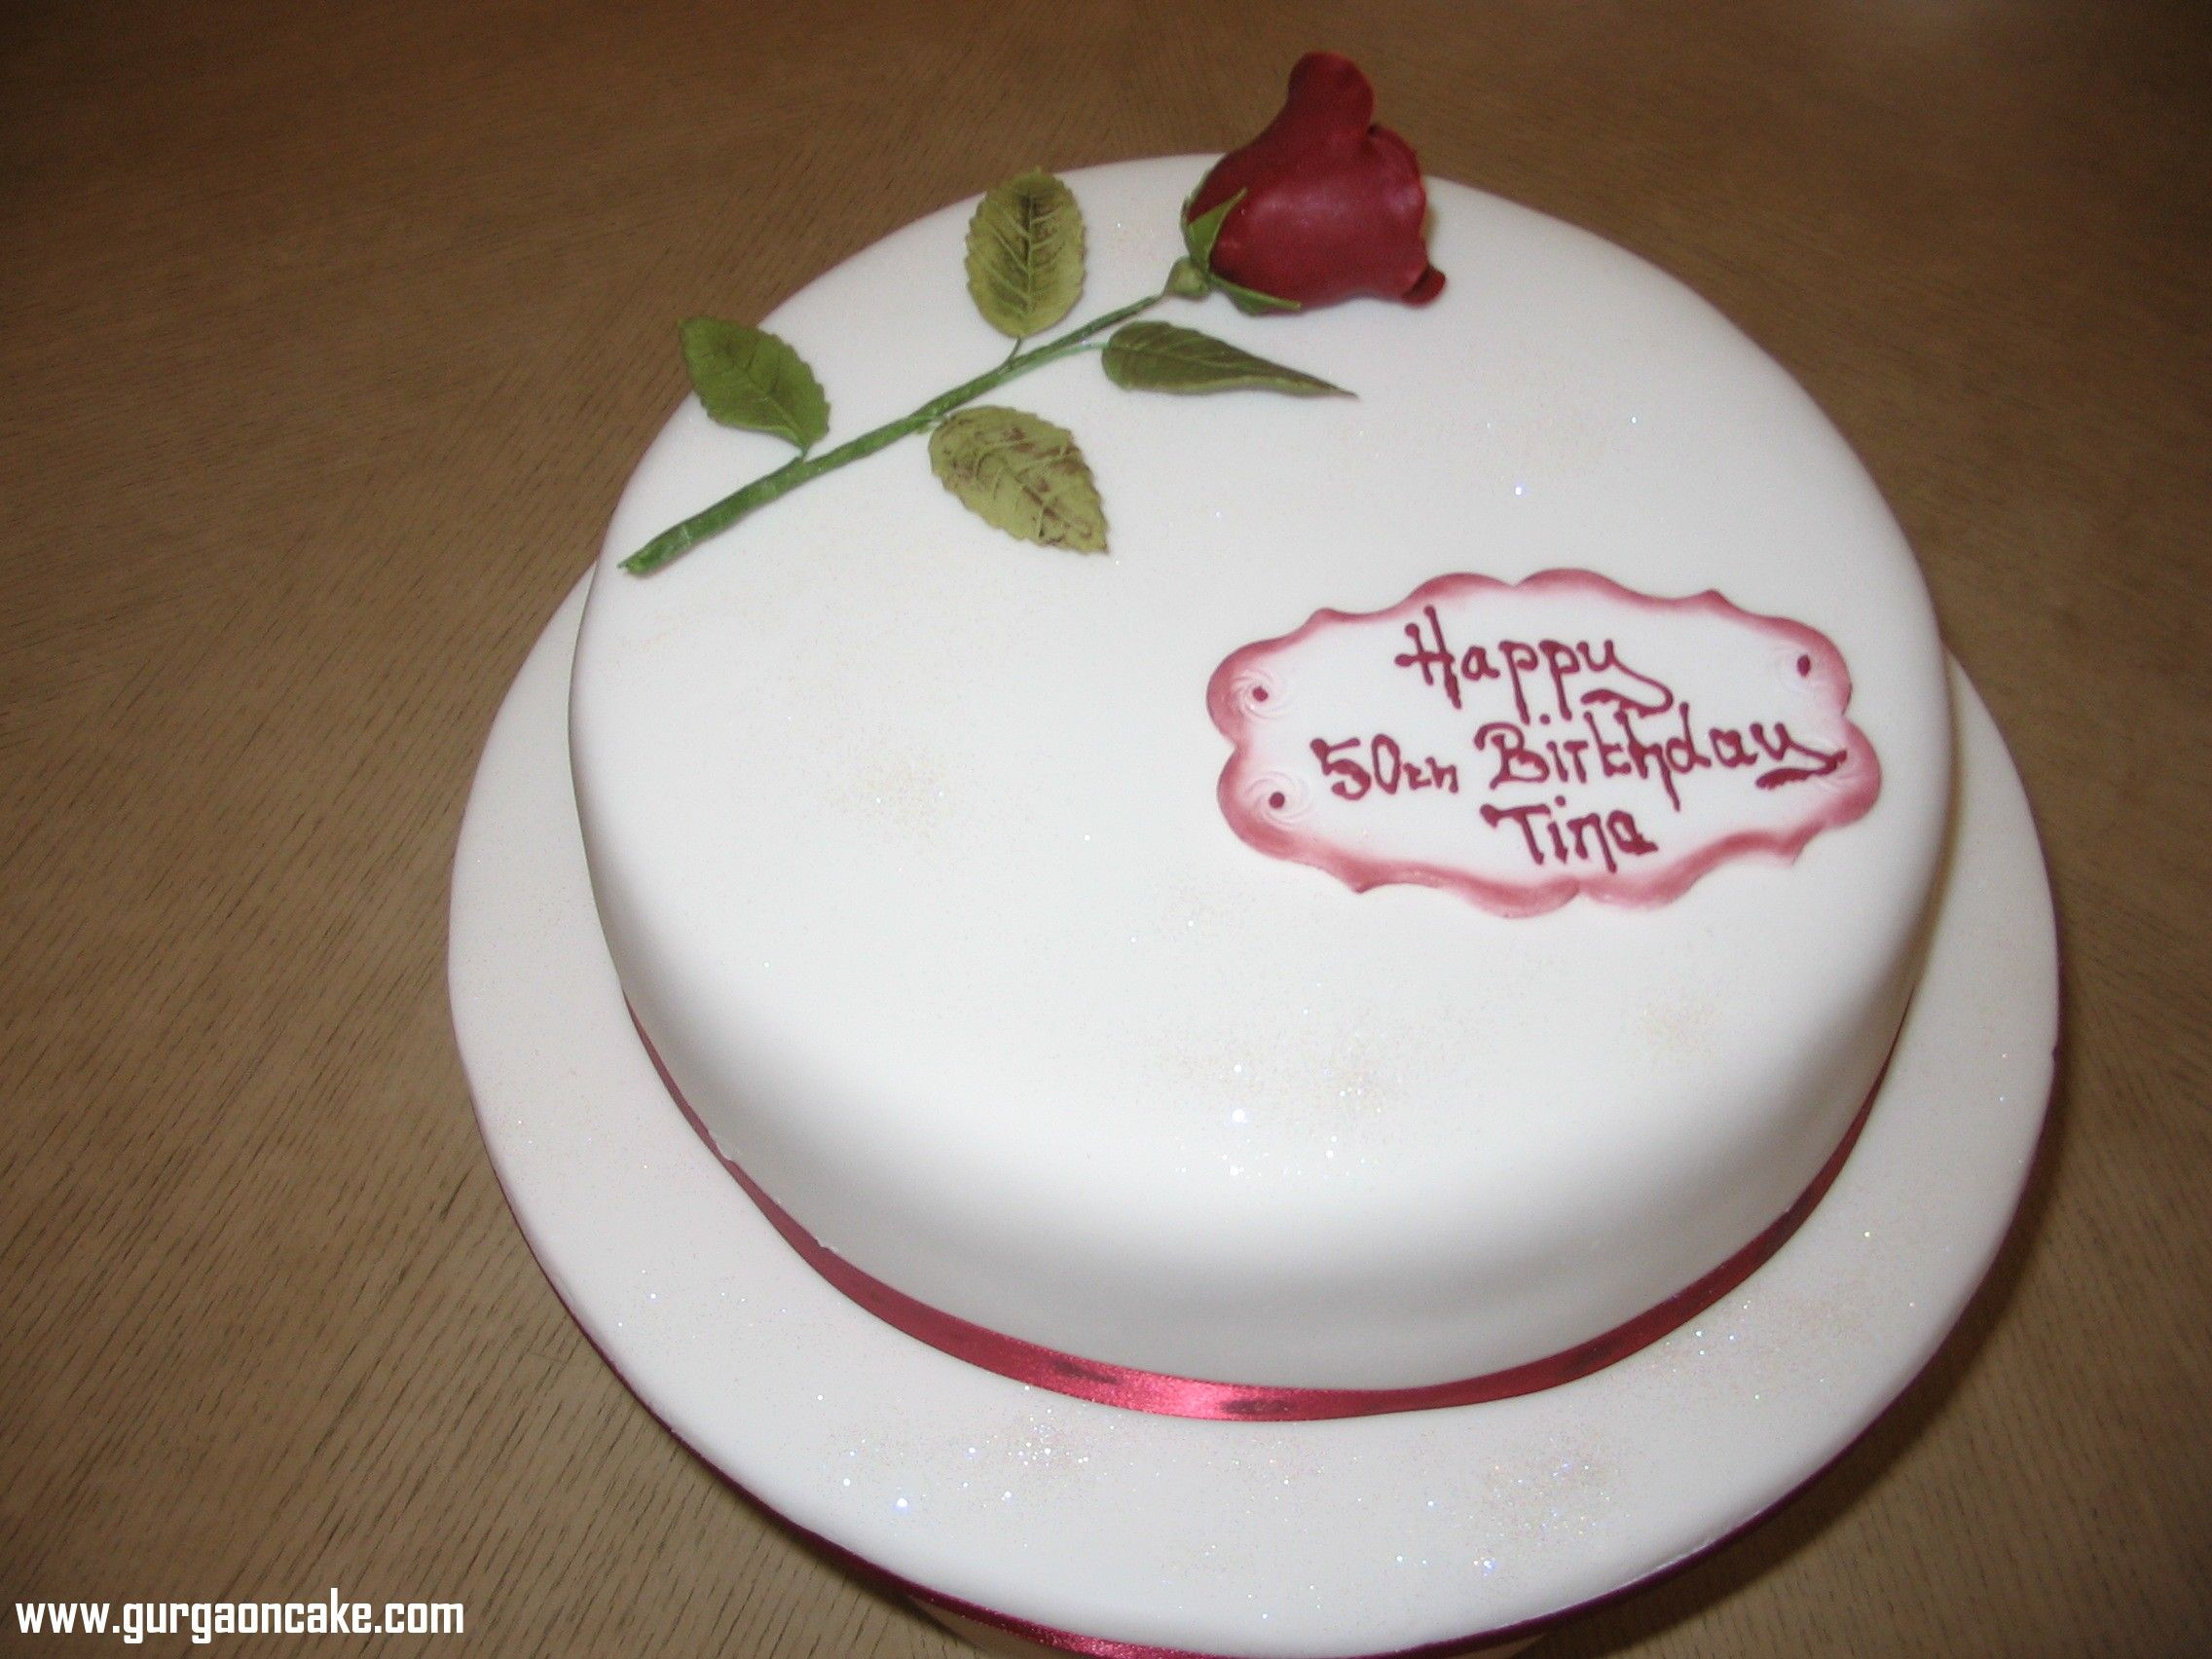 Happy Birthday Cake With Name Edit For Birthday Cake Pinterest